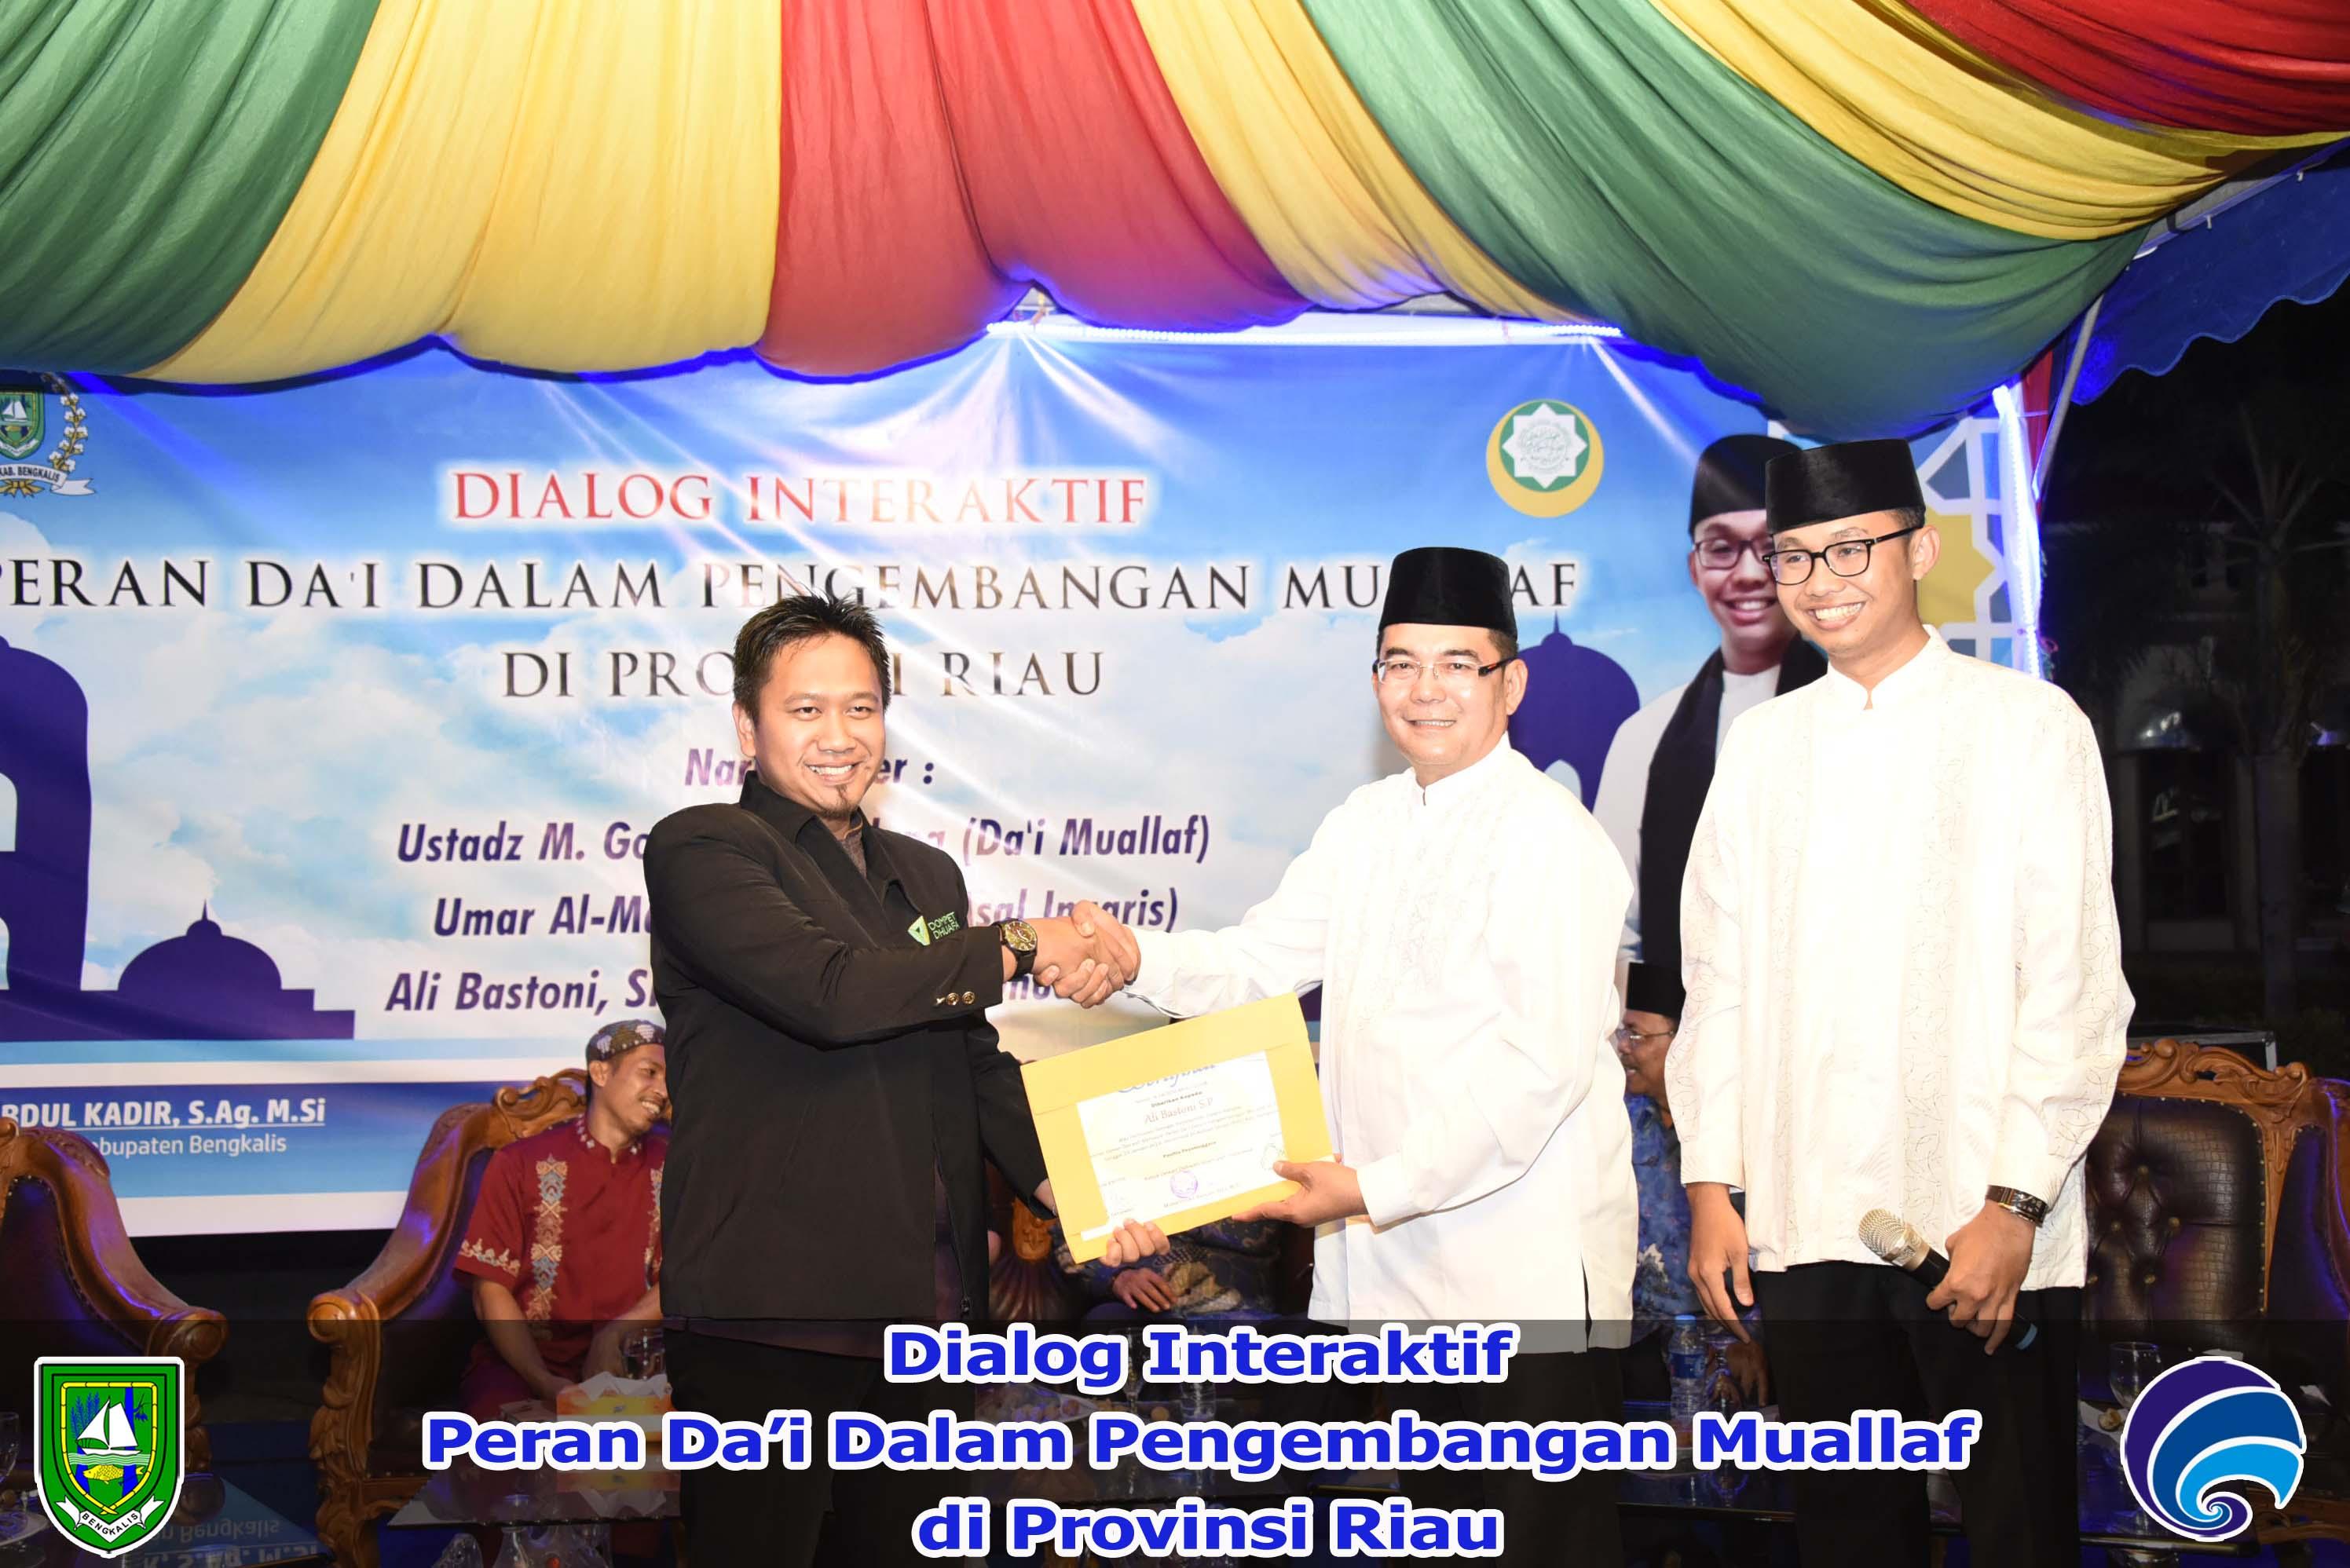 Dialog Interaktif Peran Da'i dalam Pengembangan Muallaf di Provinsi Riau